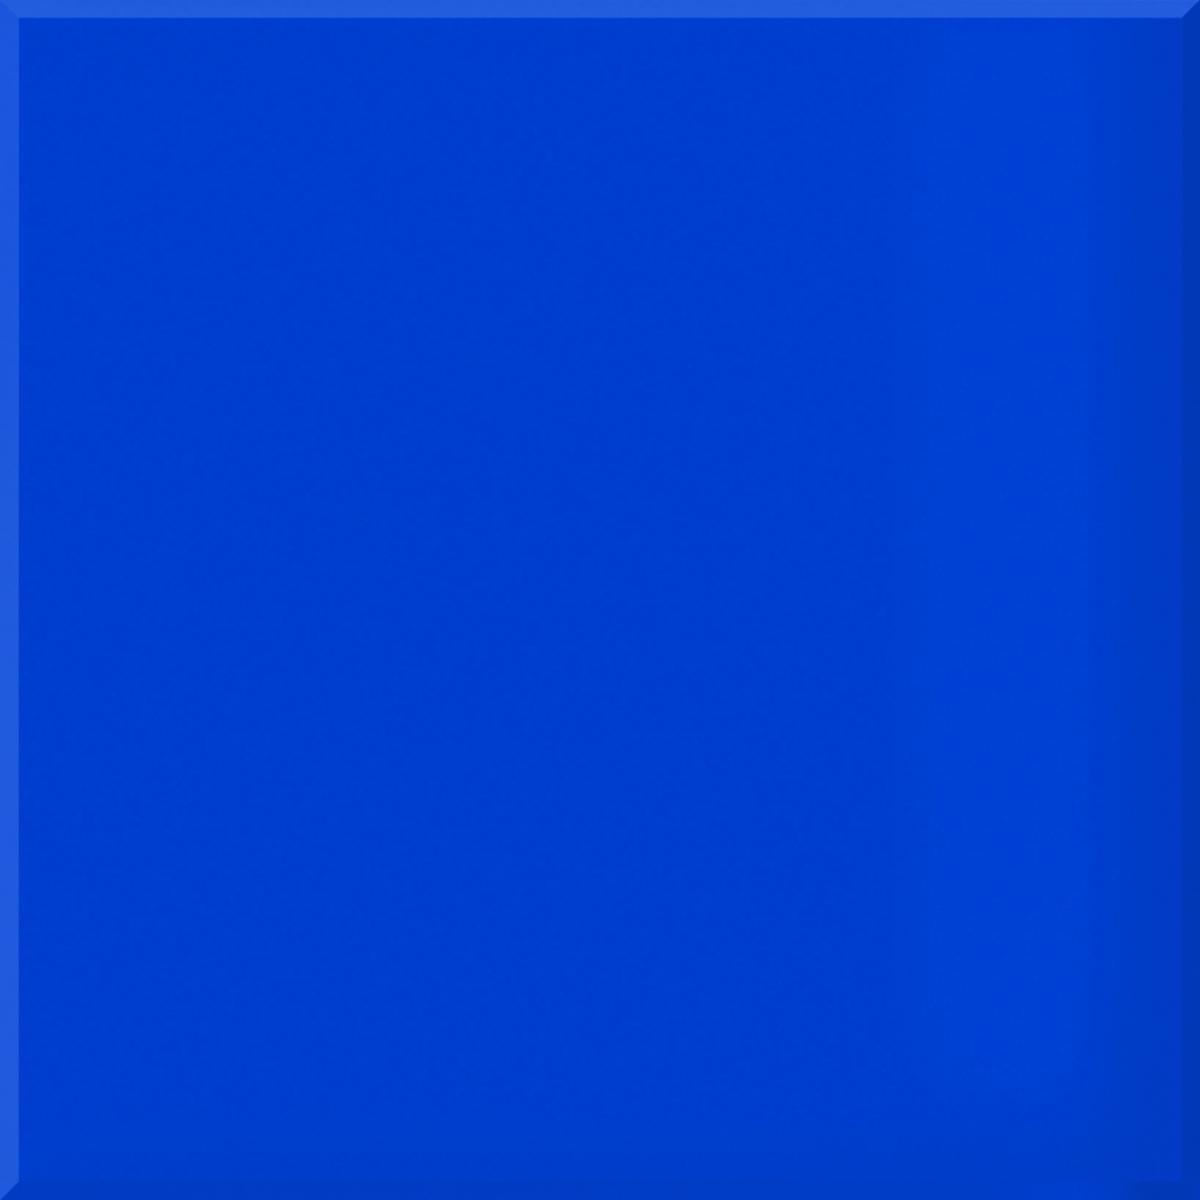 Nadstawka na Ladę Recepcyjną Victor V 066 B - RAL 5005 Signalblau